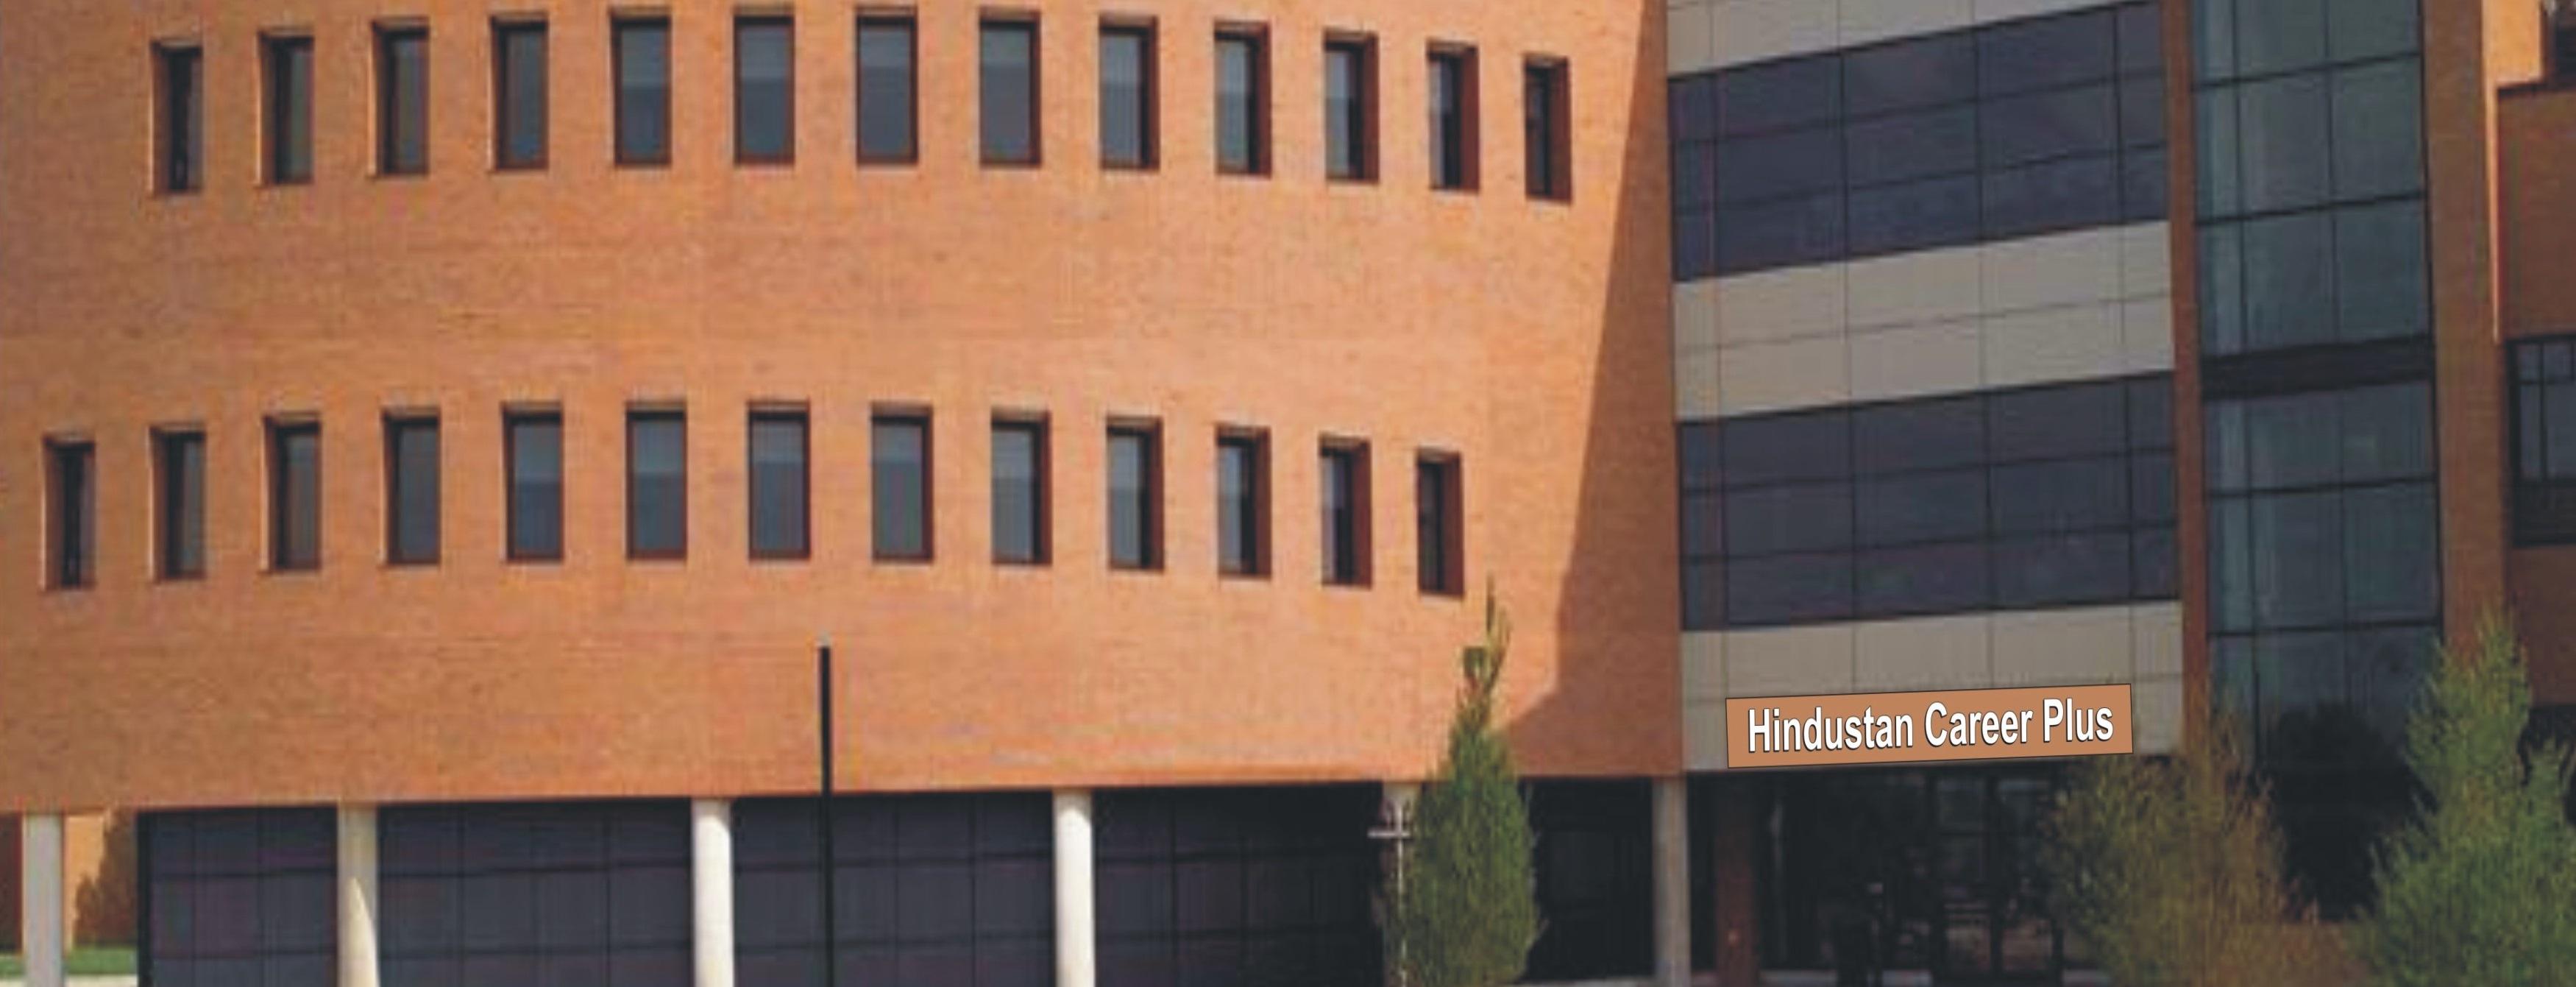 Hindustan Career Plus College, Agra